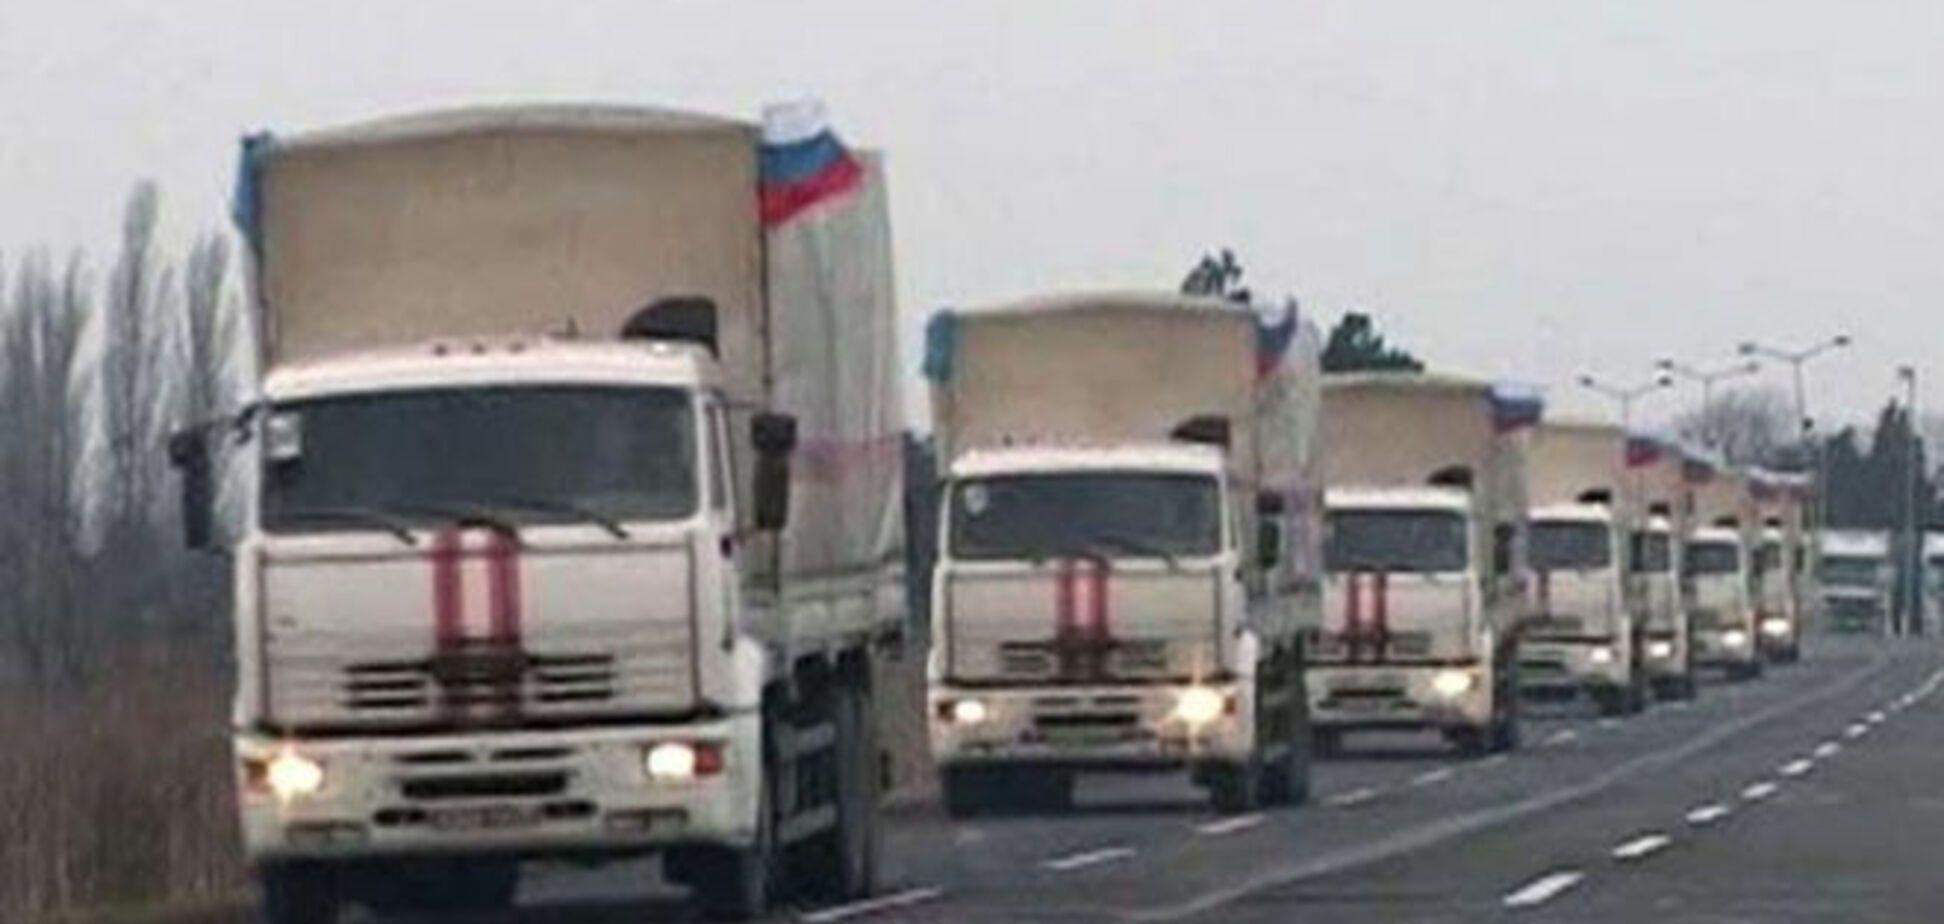 Россия грубо нарушила законы при ввозе 20-го 'гумконвоя' на Донбасс